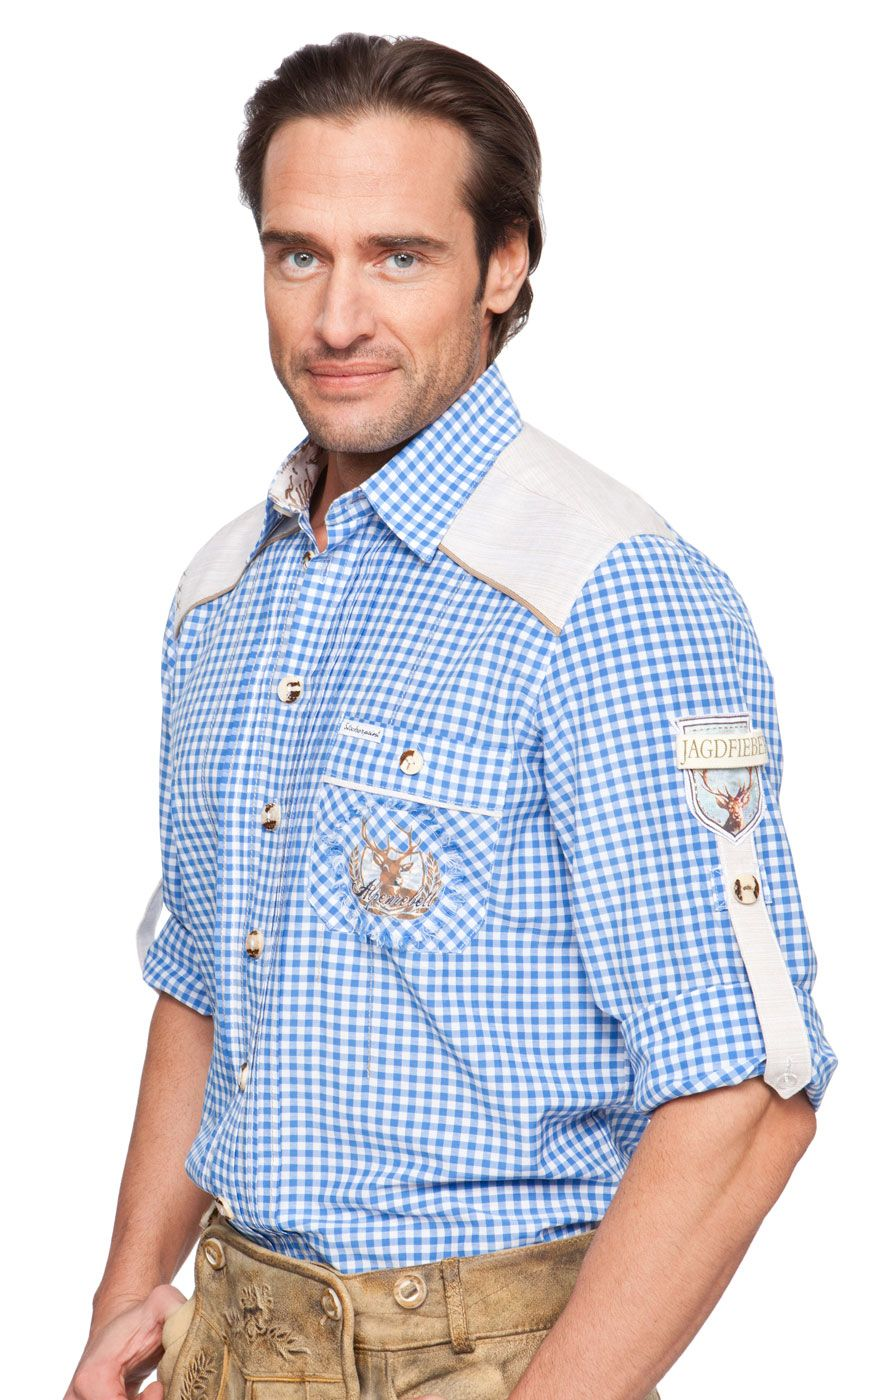 Fuchs #Trachtenmoden Herren #Trachten Hemd: